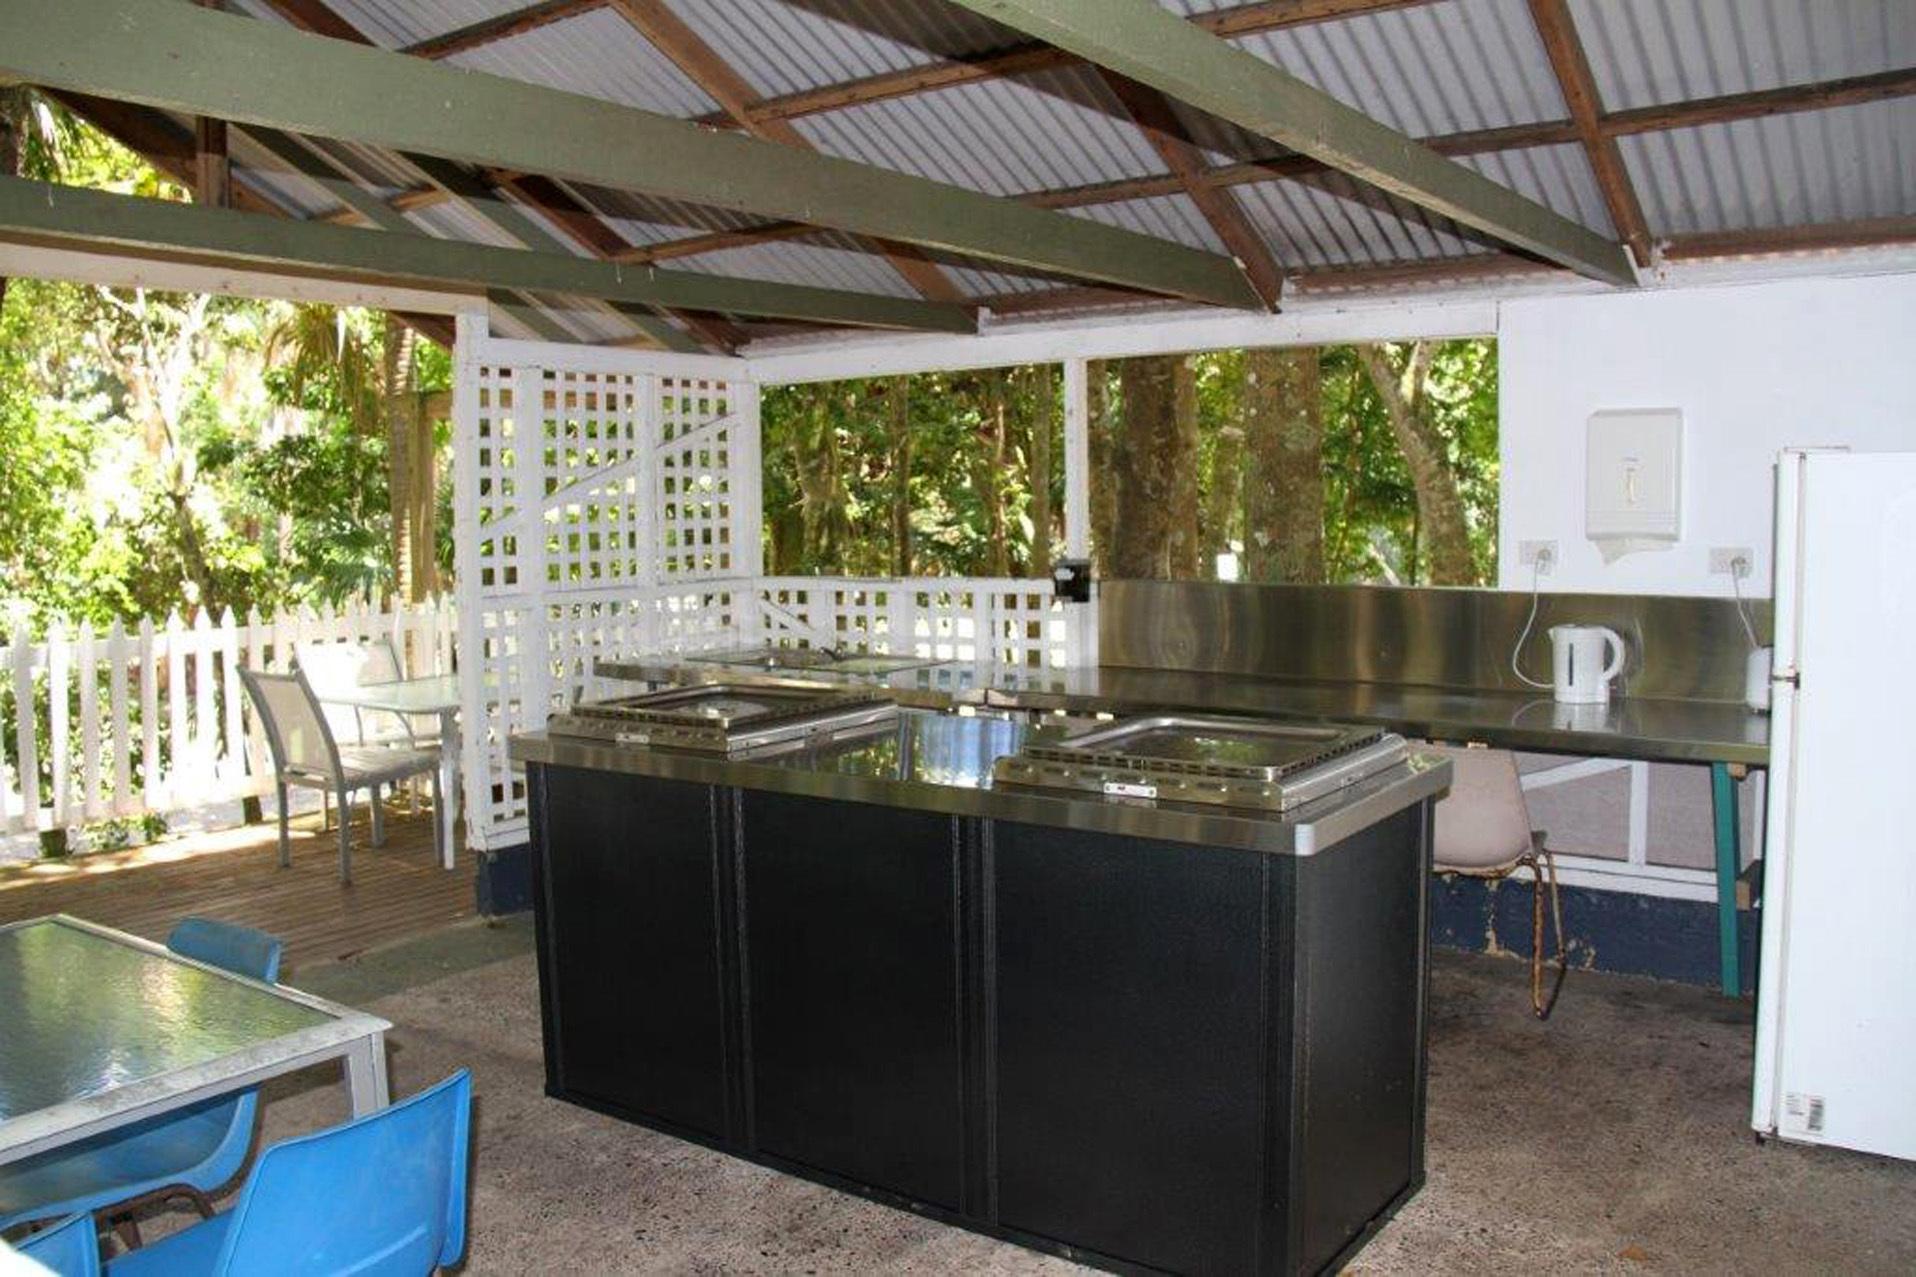 g - Tiona Palms Caravan Park